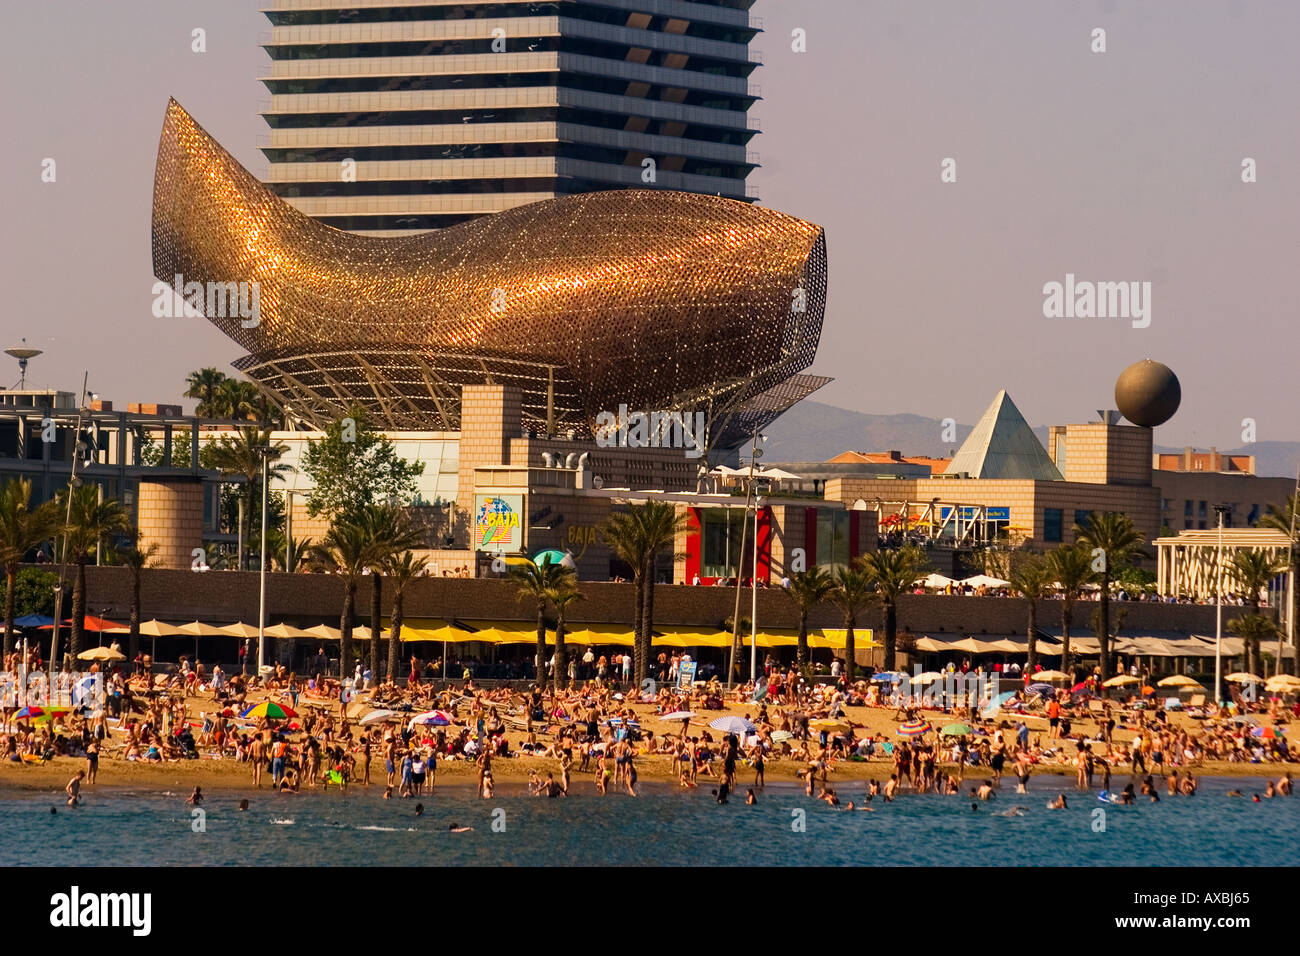 ESP Spain Barcelona beach Platja de la Barceloneta Hotels Arts skulpture by Frank Gehry Passeig Maritim Promenade - Stock Image